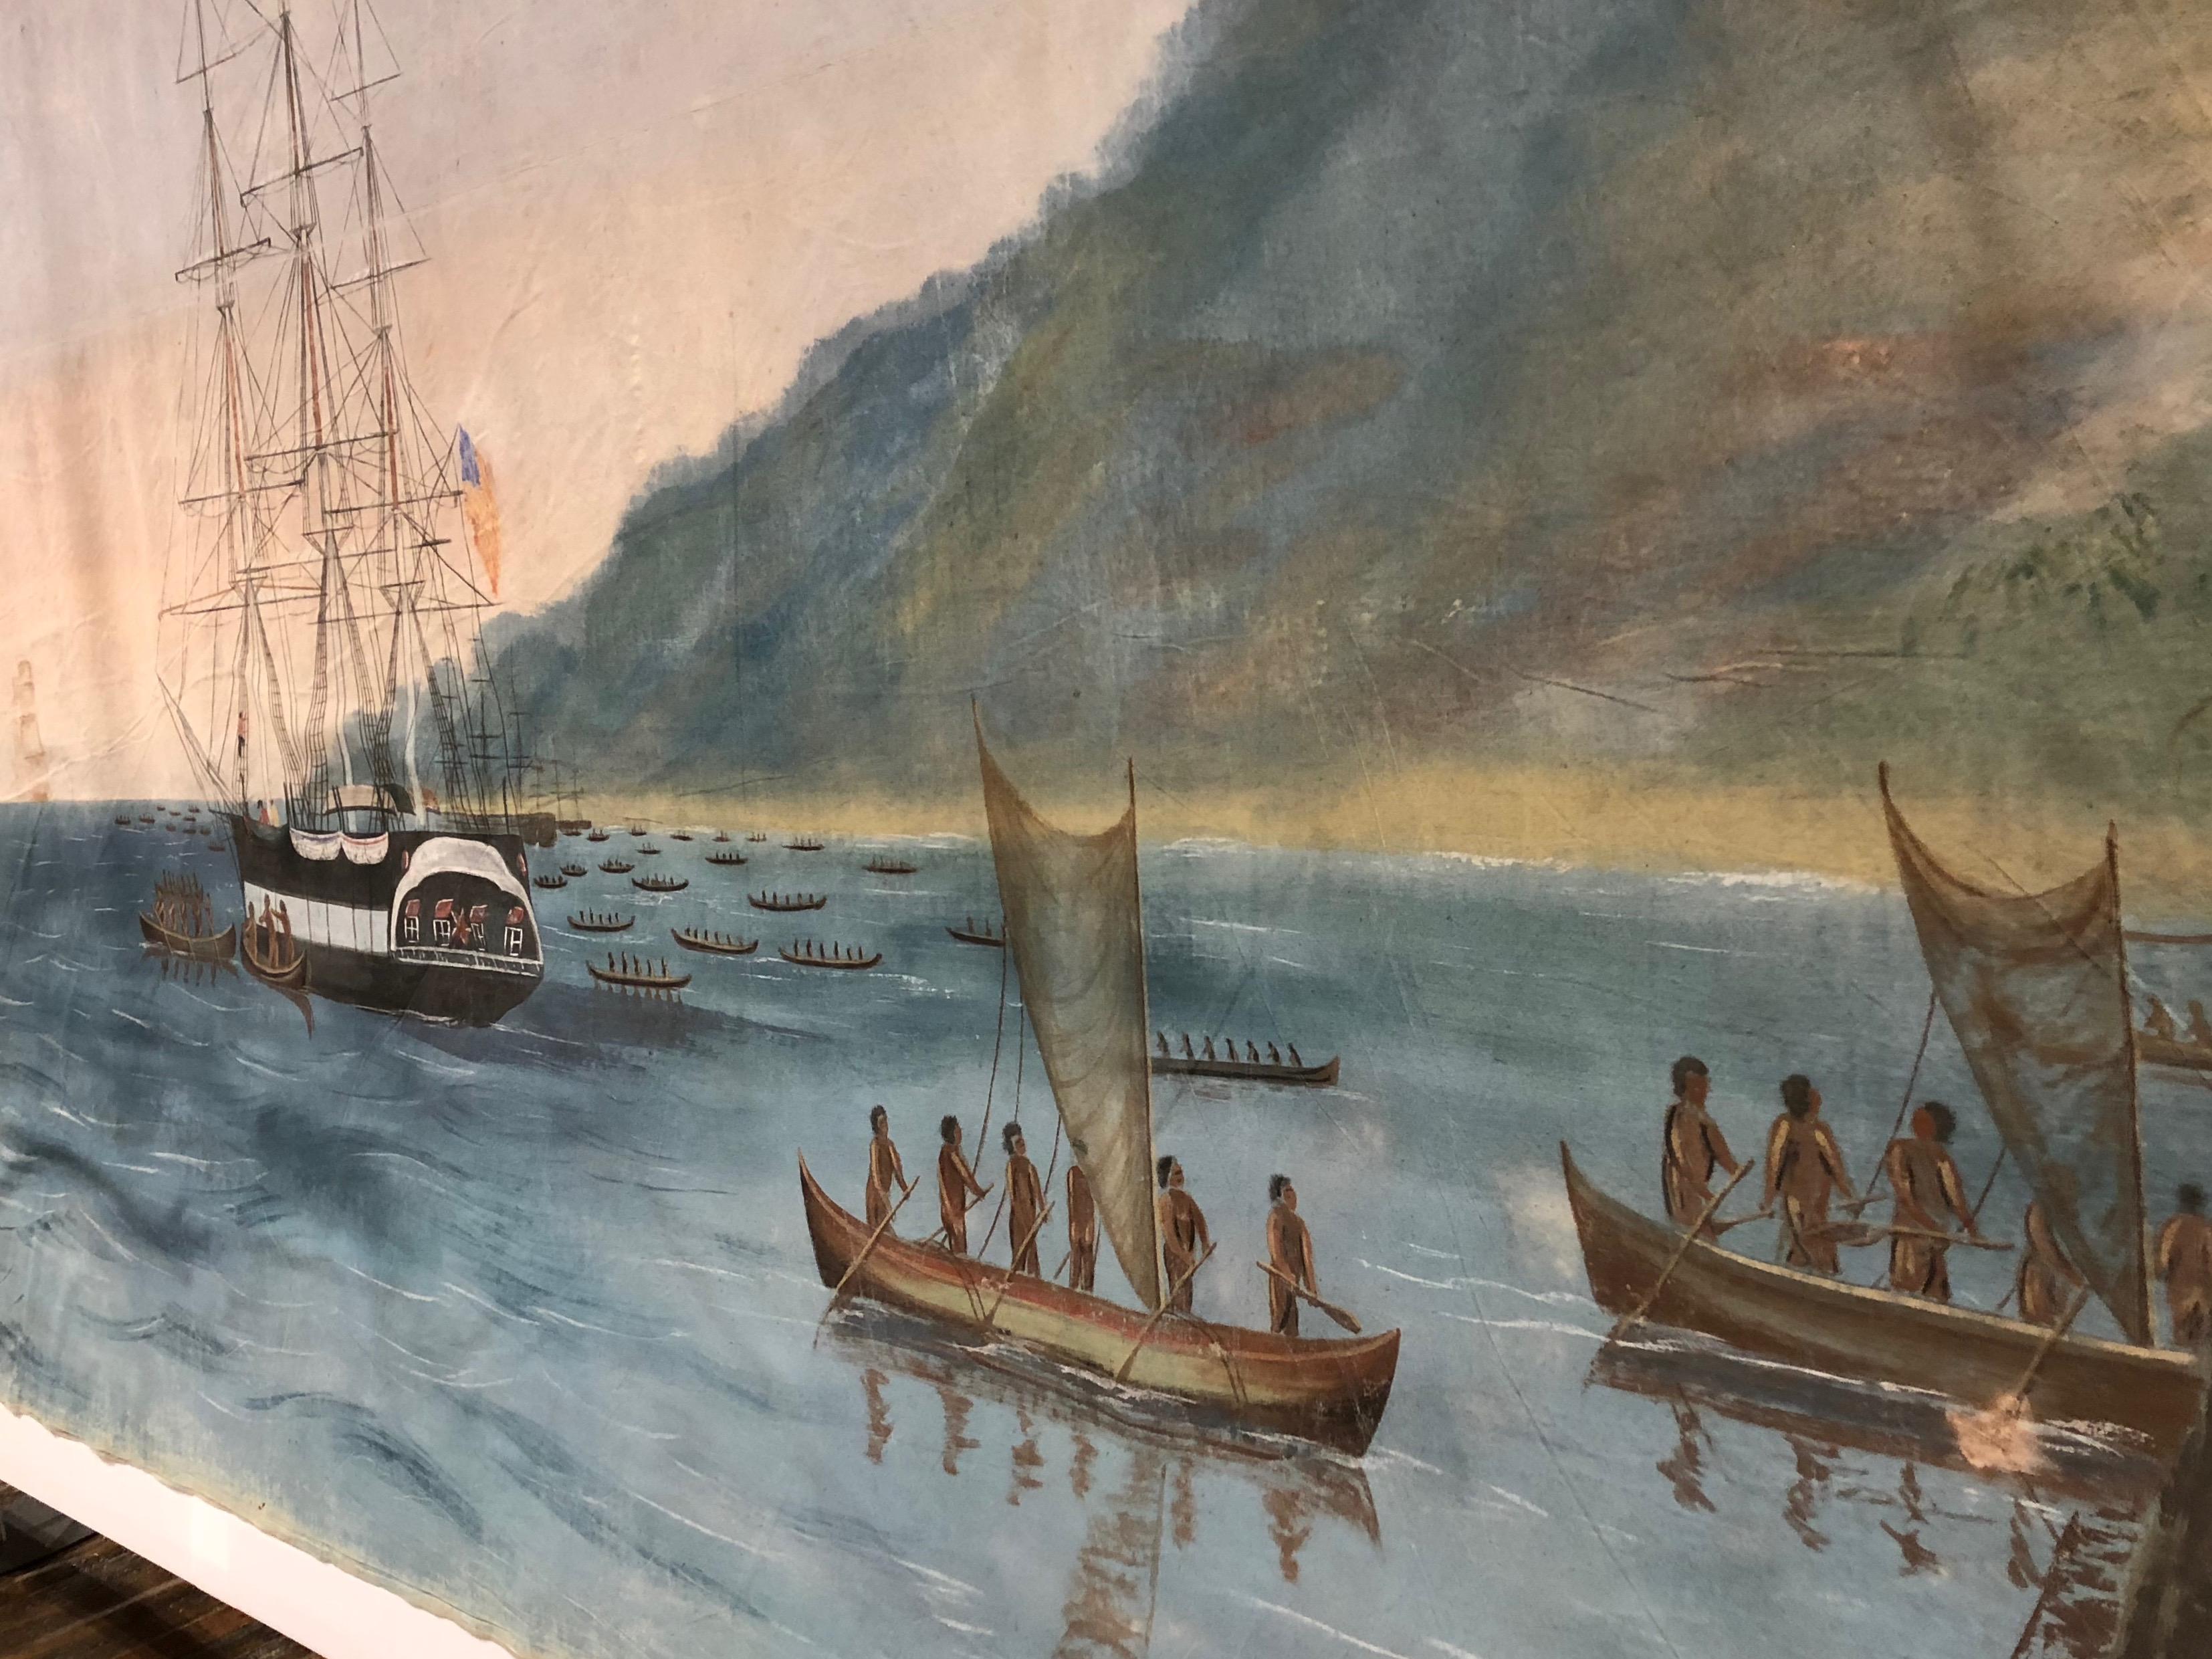 092518-Polynesia-and-whaler